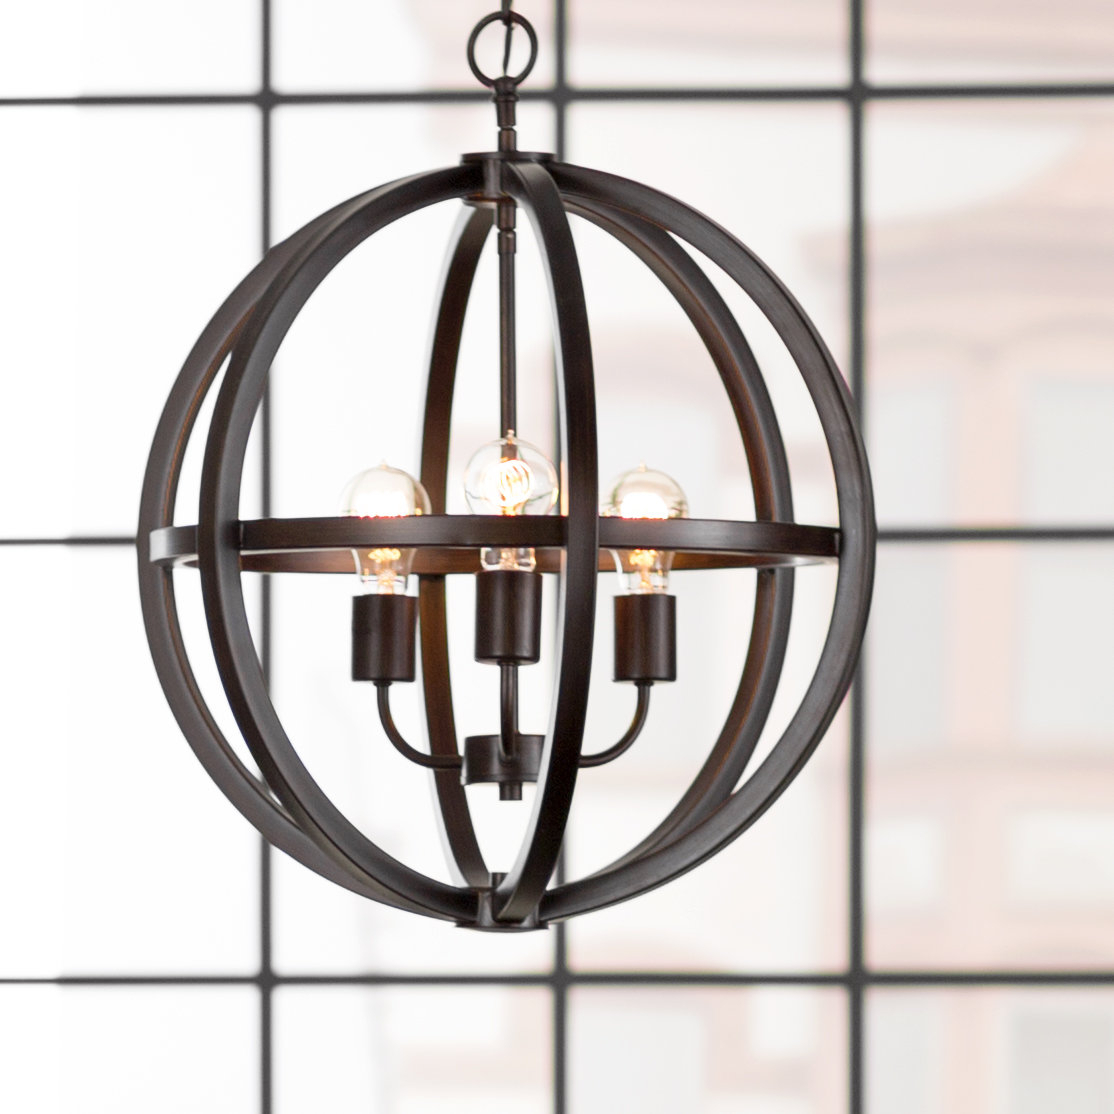 Irwin Globe Pendant with regard to Irwin 1-Light Single Globe Pendants (Image 16 of 30)